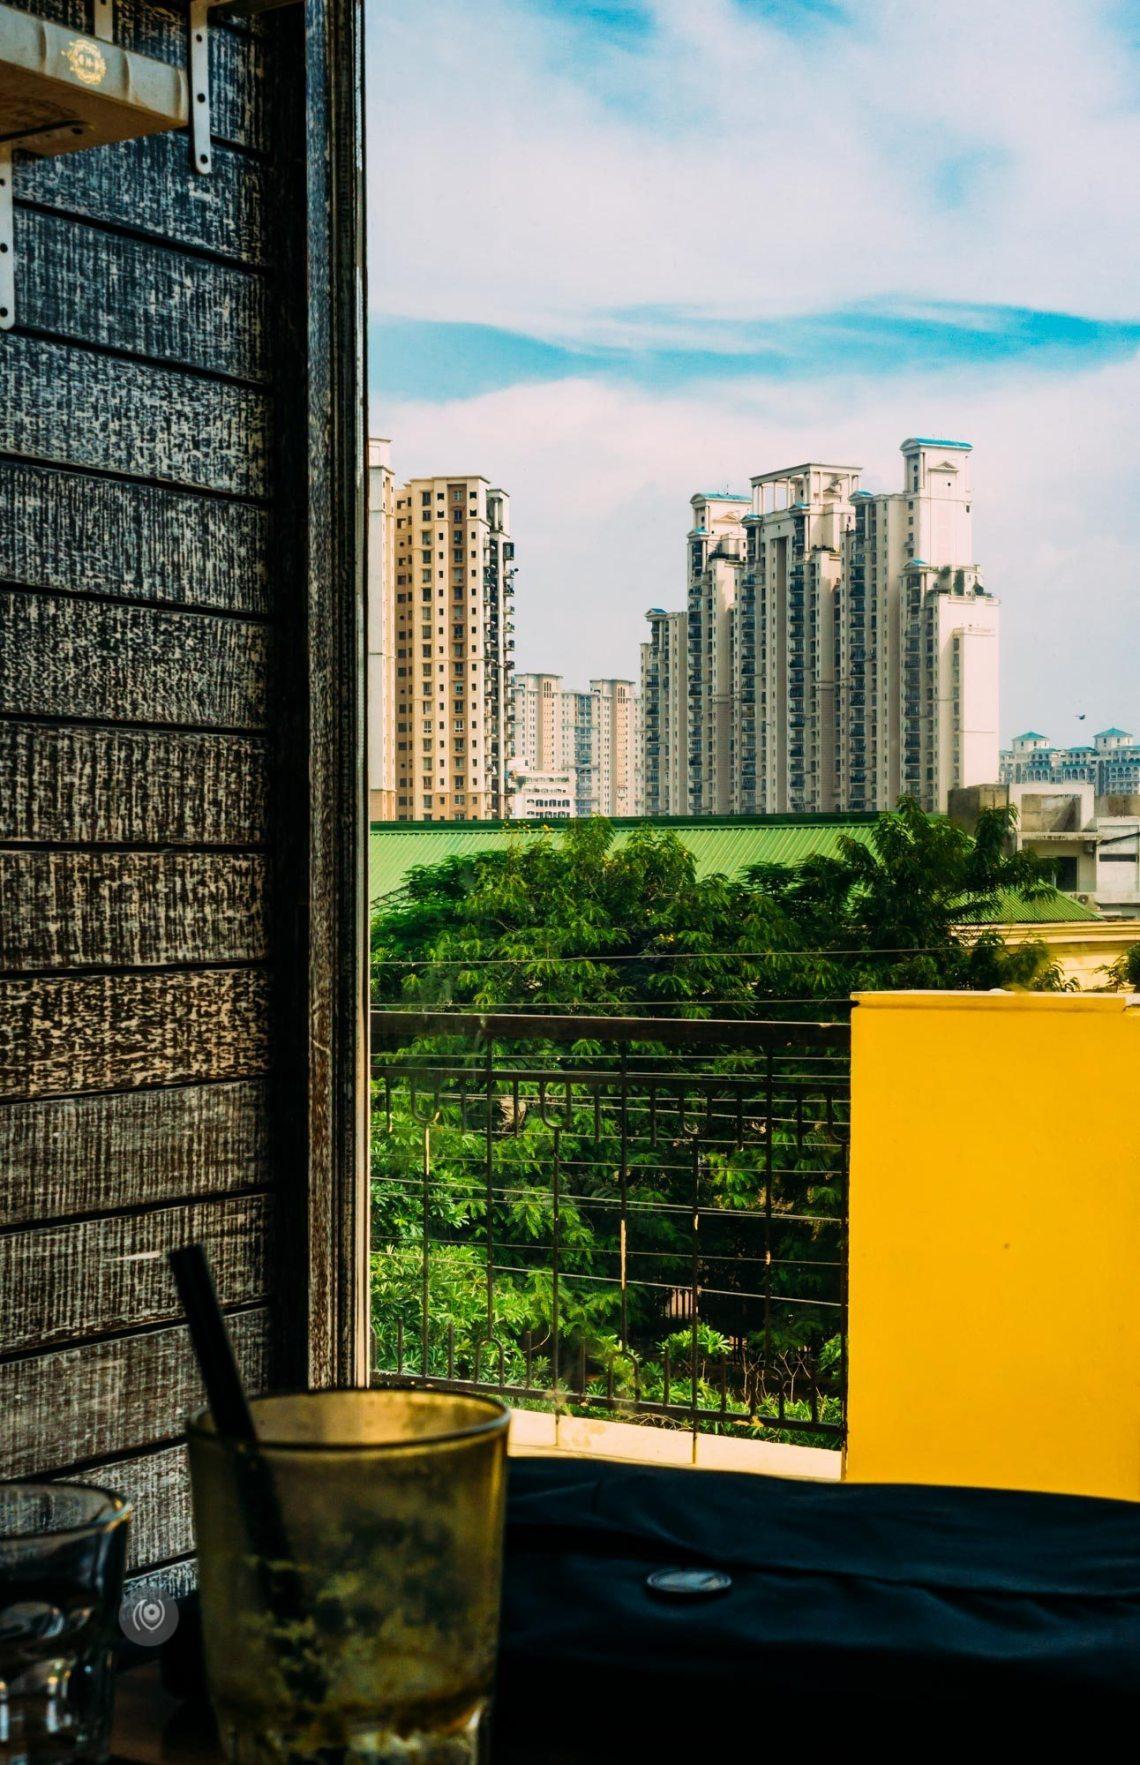 Naina.co, Visual Storyteller, Luxury Brands, Naina Redhu, Professional Photographer, Experience Collector, Luxury Photographer, Luxury Blogger, Lifestyle, Visual Storyteller for Luxury Brands, #EyesForGurgaon, Eyes For Gurgaon, #EyesForGurugram, Eyes For Gurugram, TEDxGurugram, TED, TEDx, Cityscape, Gurgaon Photographer